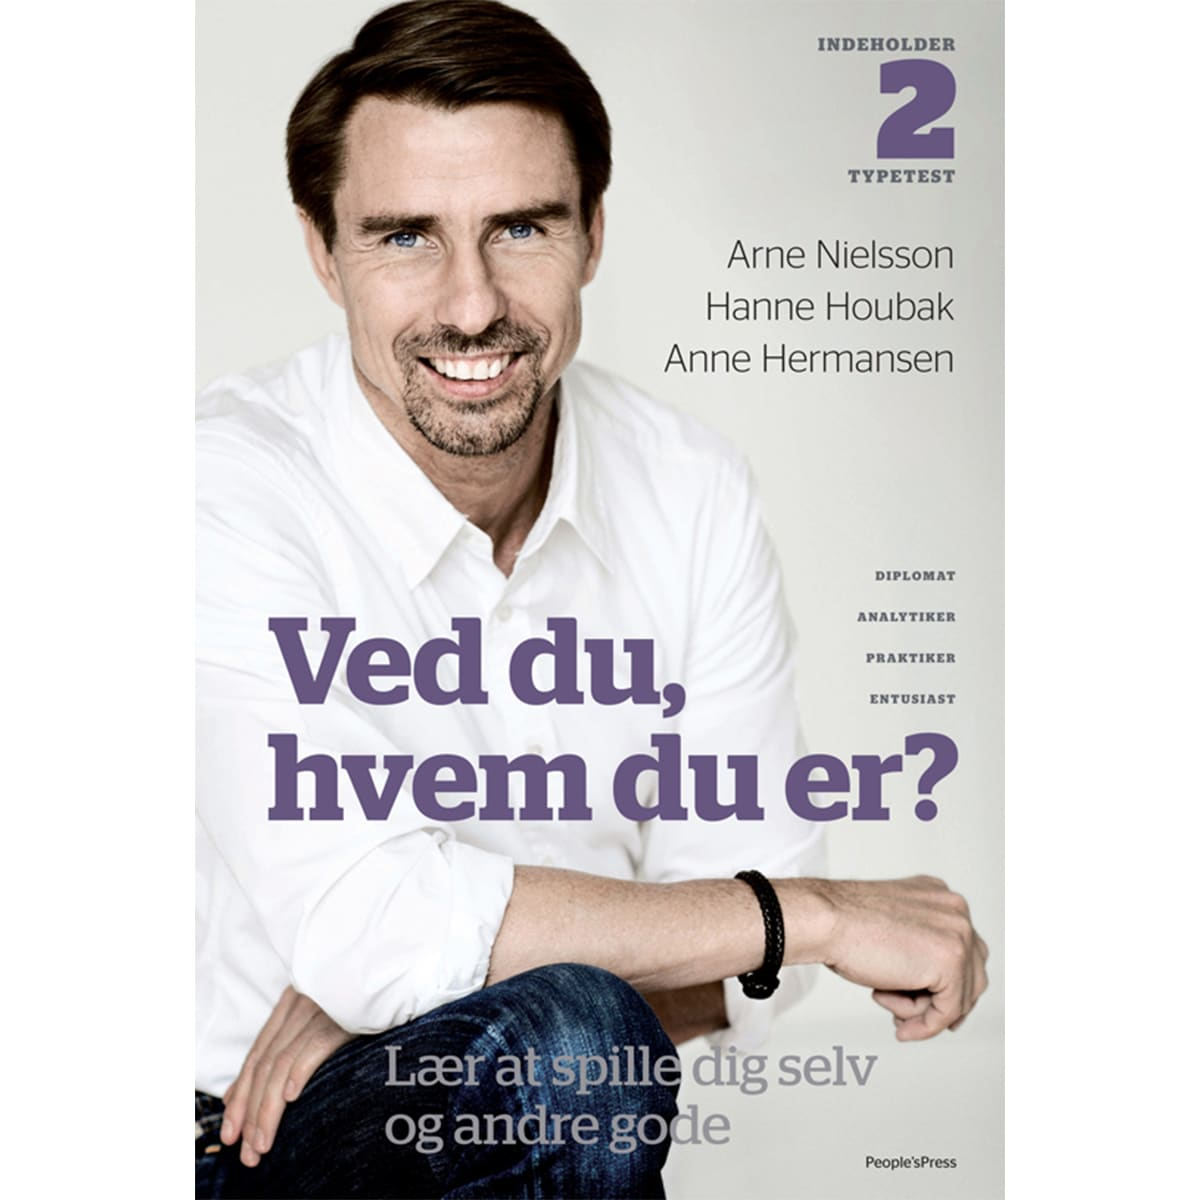 Af Arne Nielsson, Hanne Houbak & Anne Hermansen